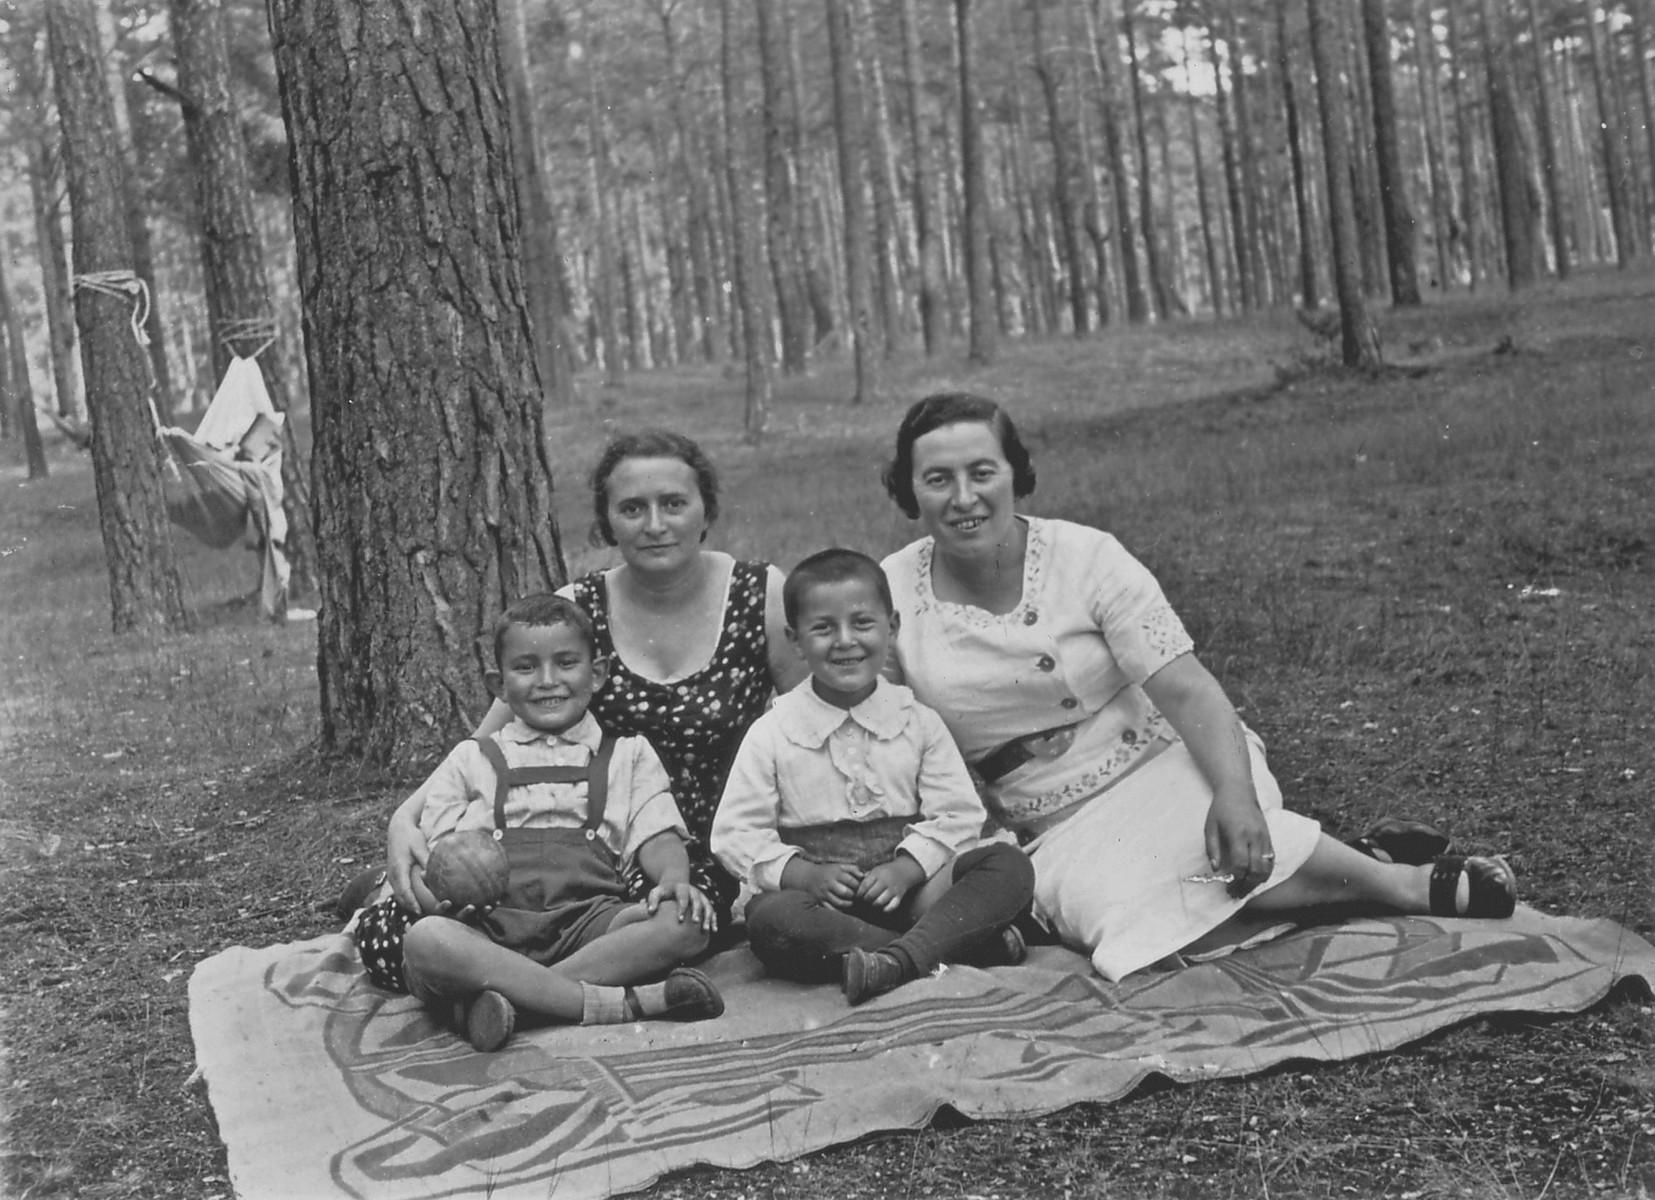 Lejb and Fejgla Melamdowicz sit on a blanket in a park with friends.